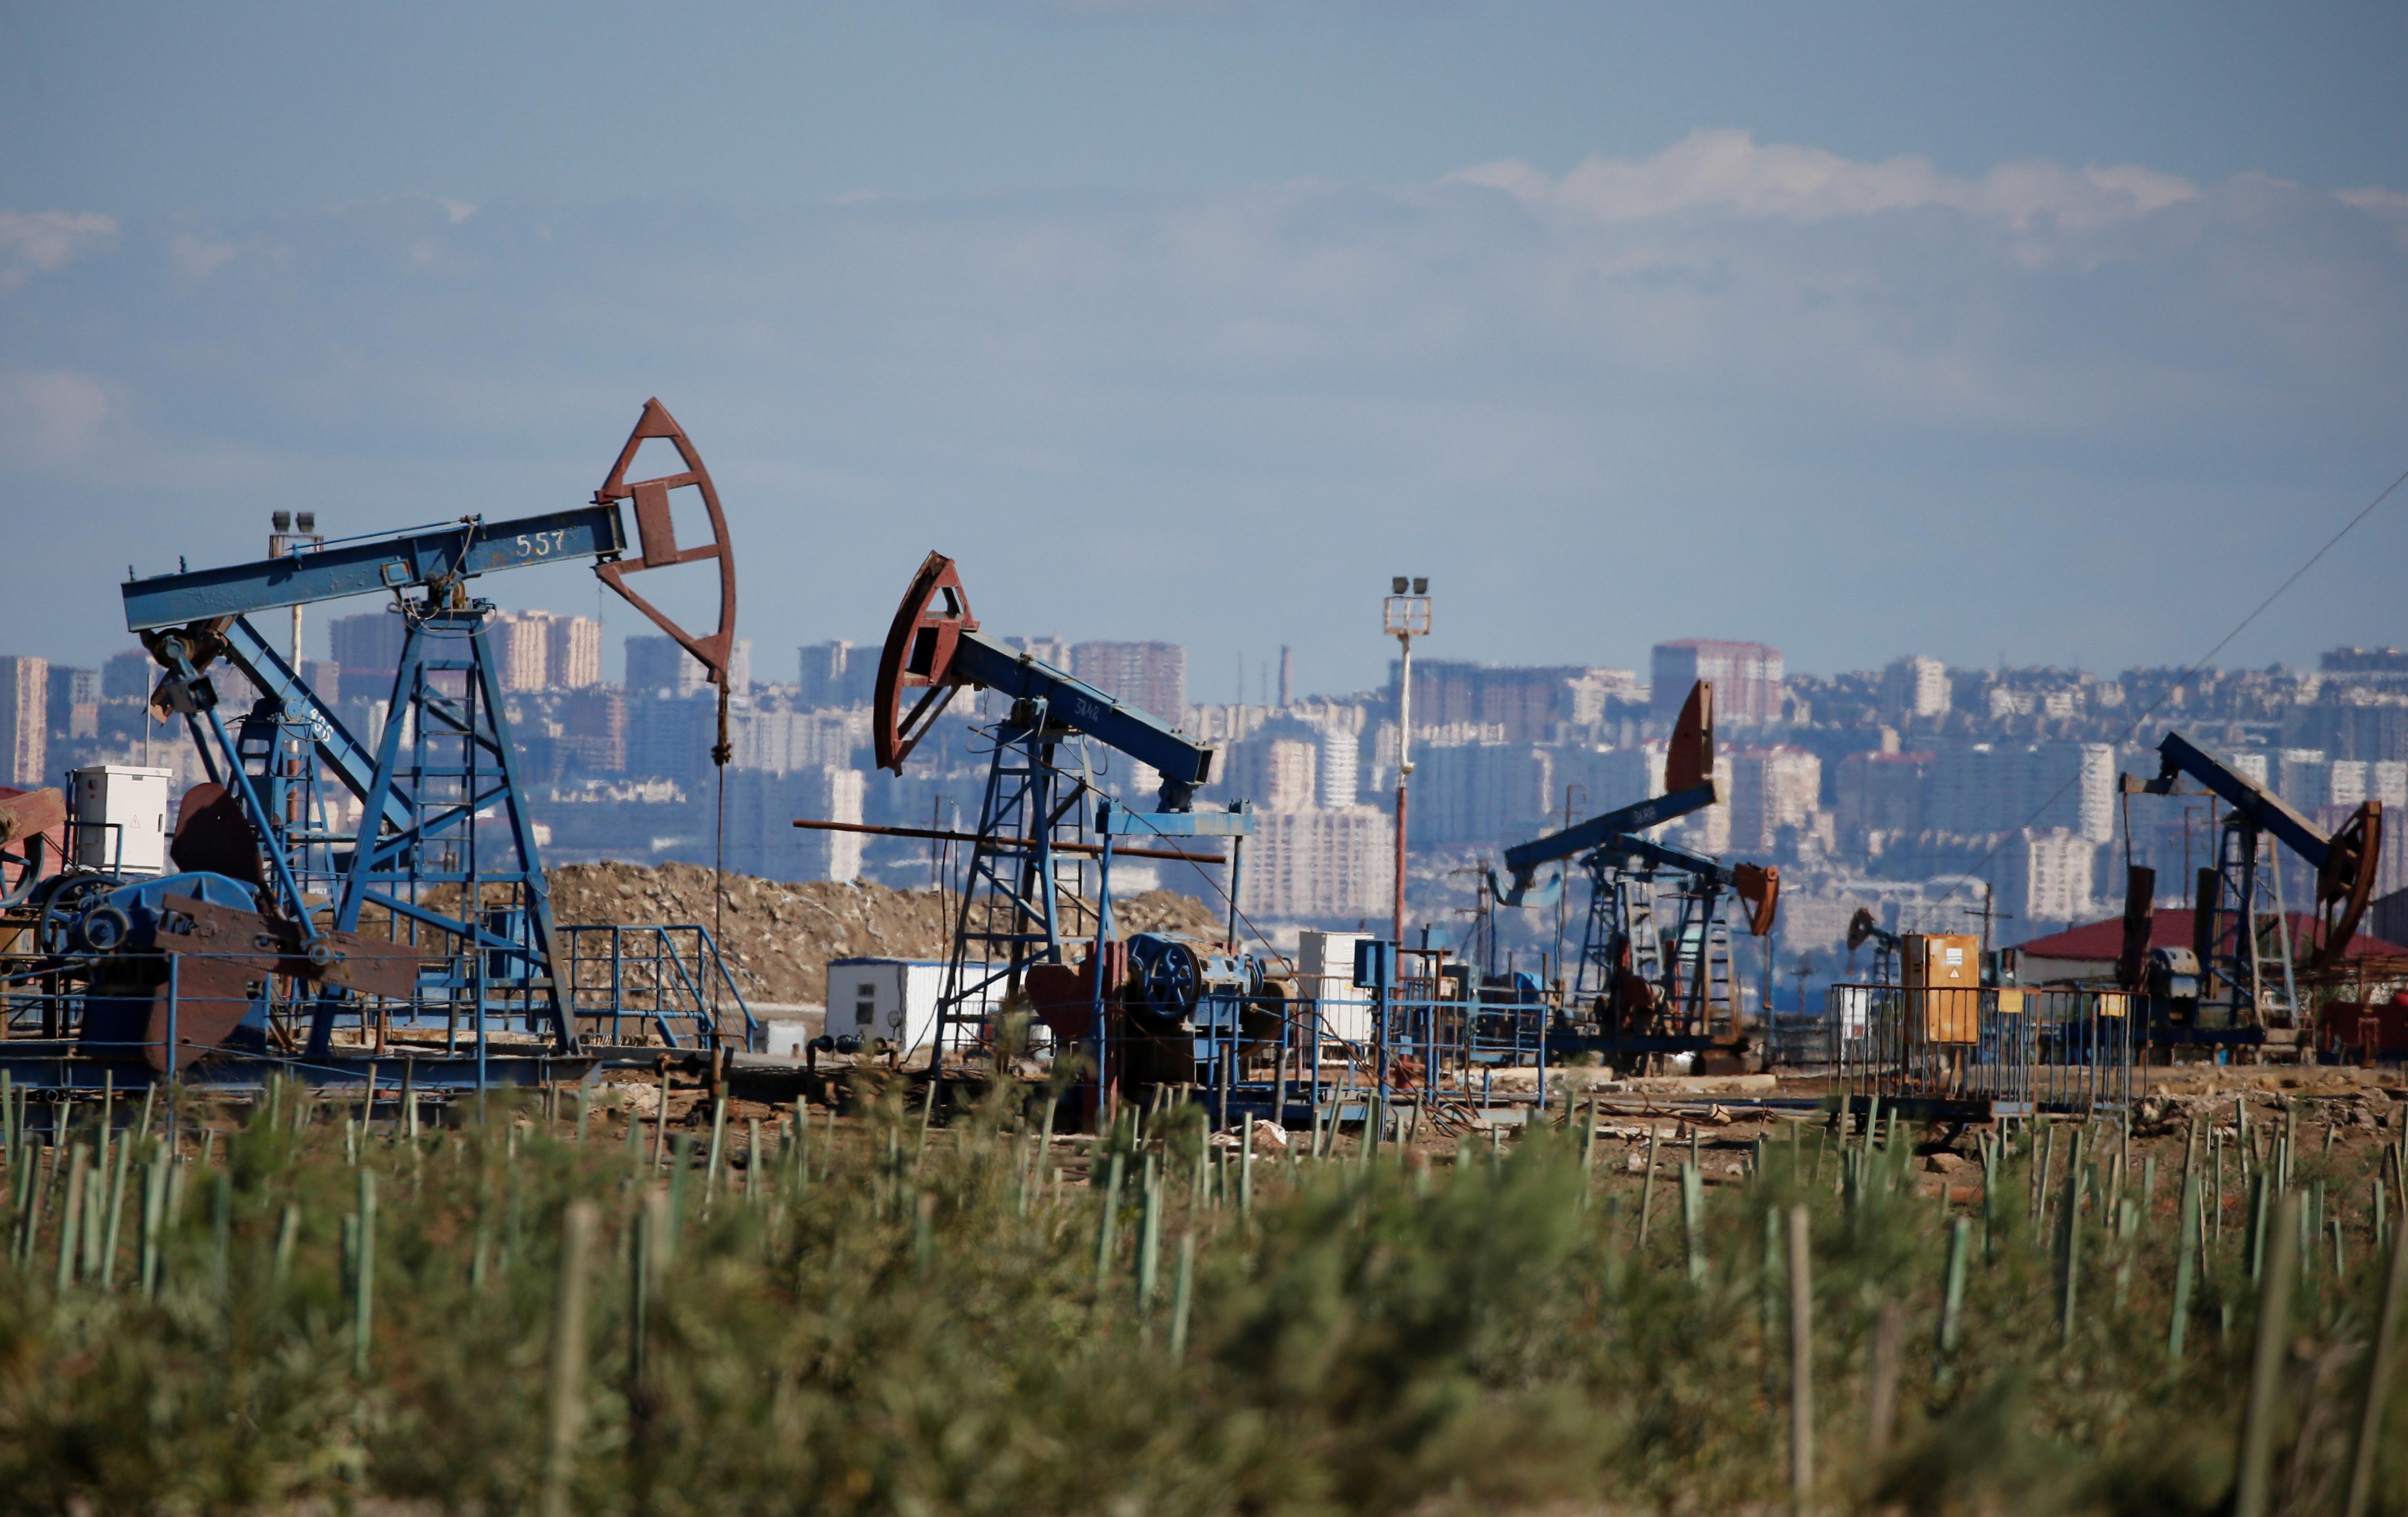 A Trans-Caspian Gas Pipeline: Start Small but Aim Big